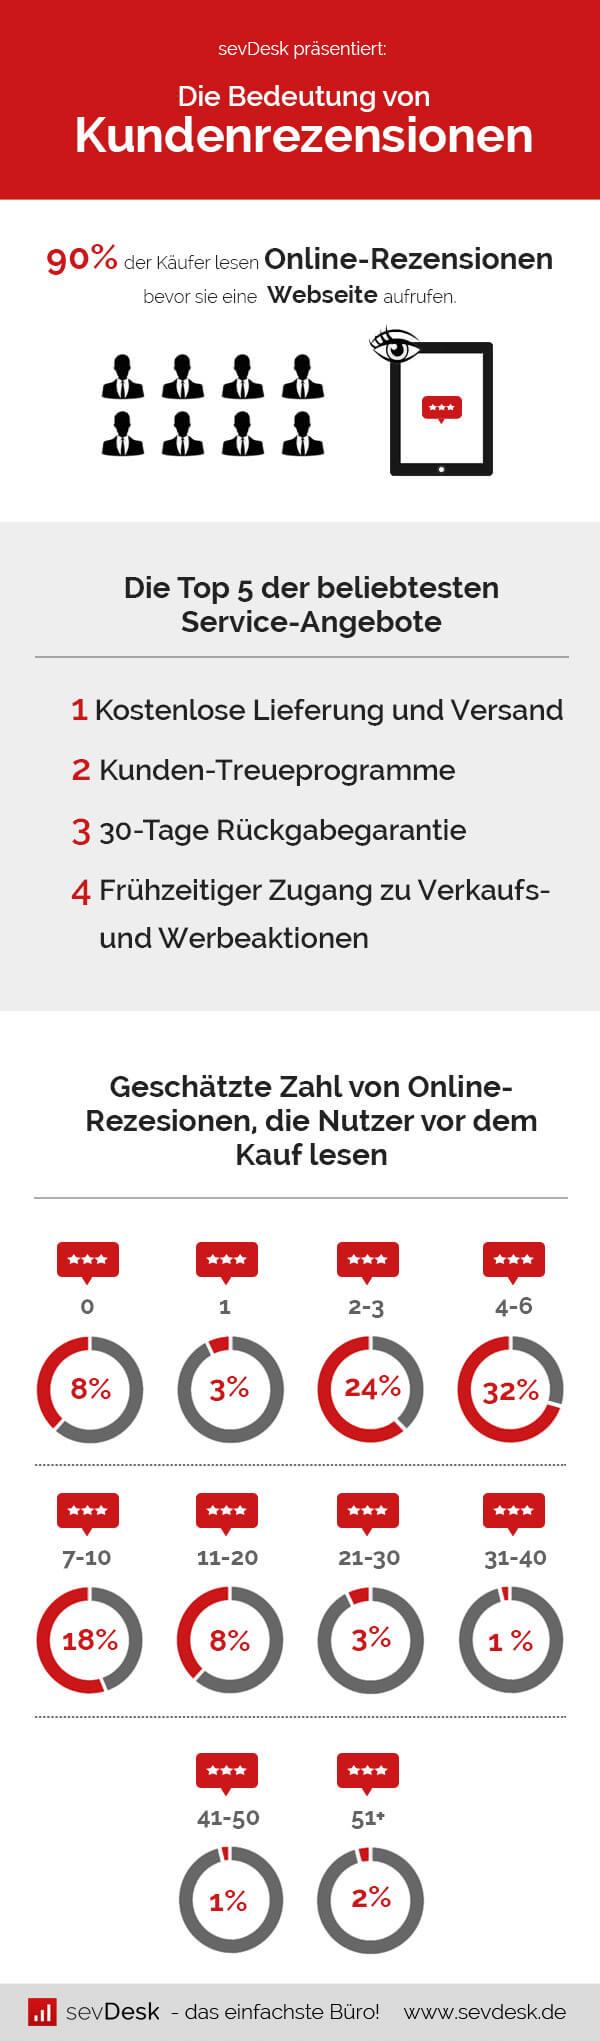 Infografik Sales